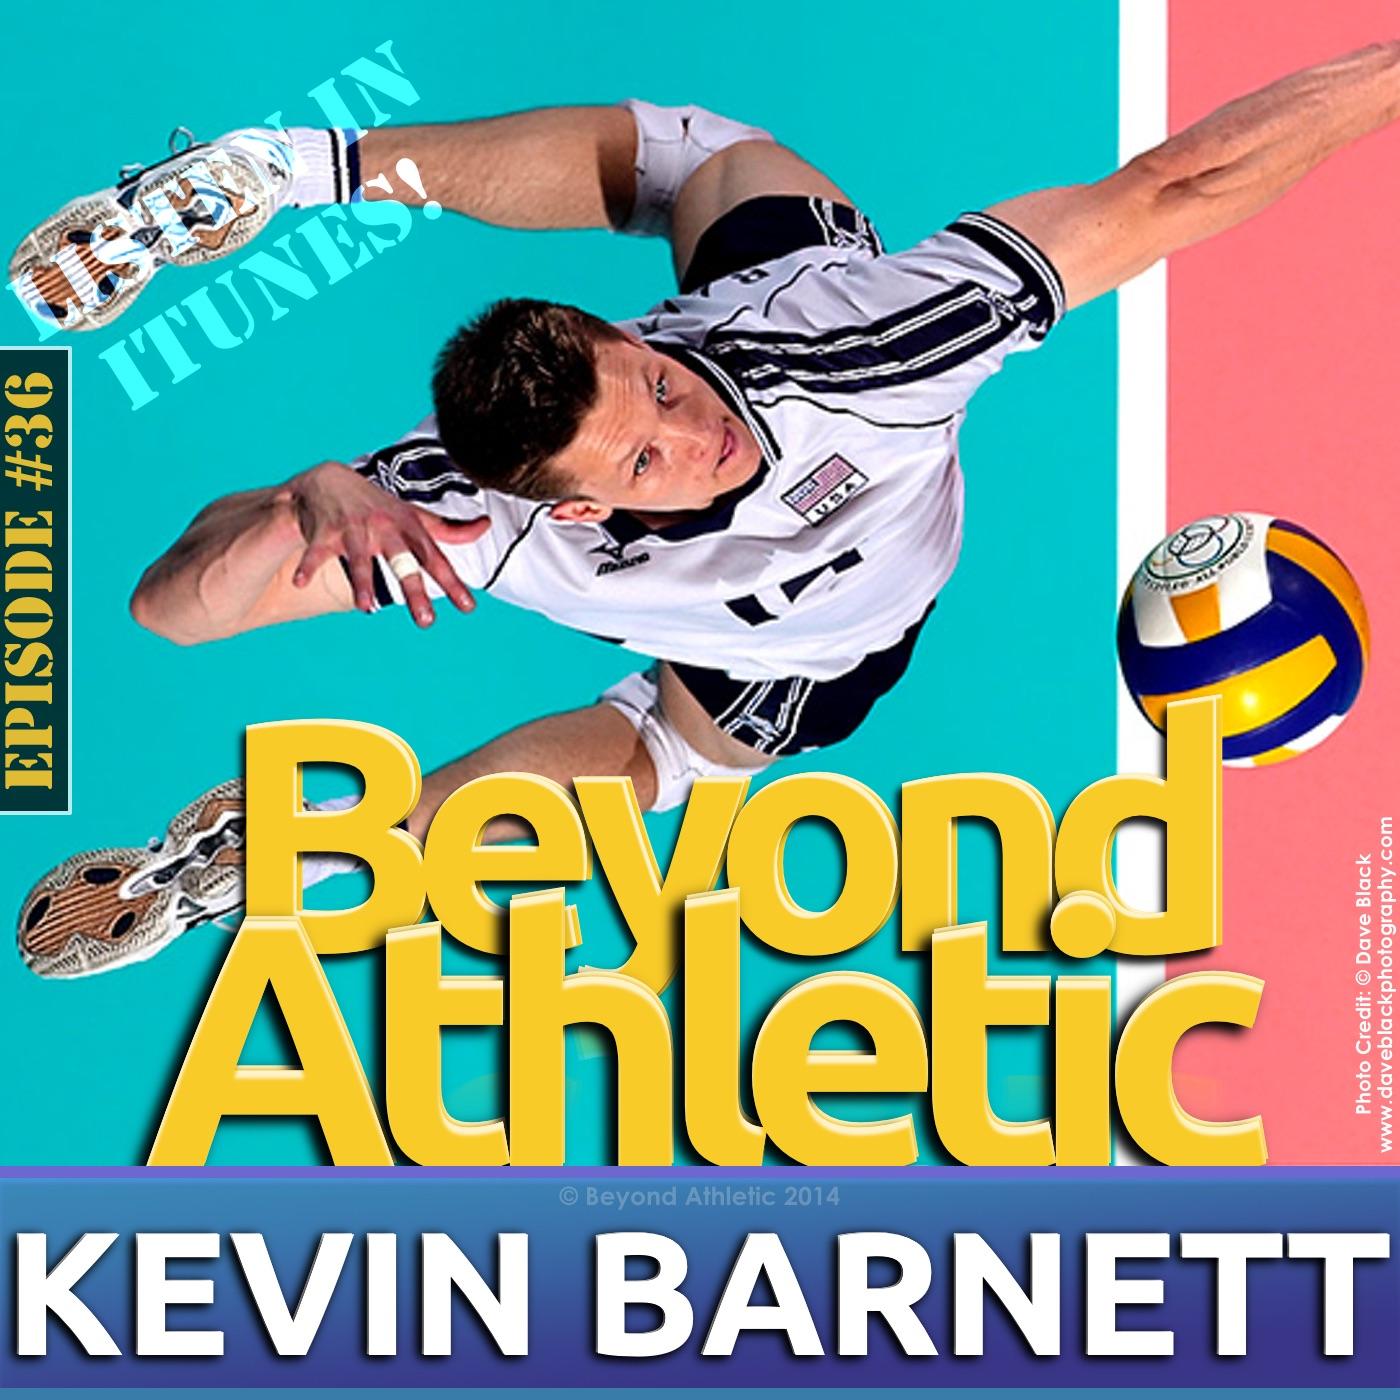 KEVIN BARNETT | 2X OLYMPIAN & BROADCASTER | BEYONDATHLETIC.COM